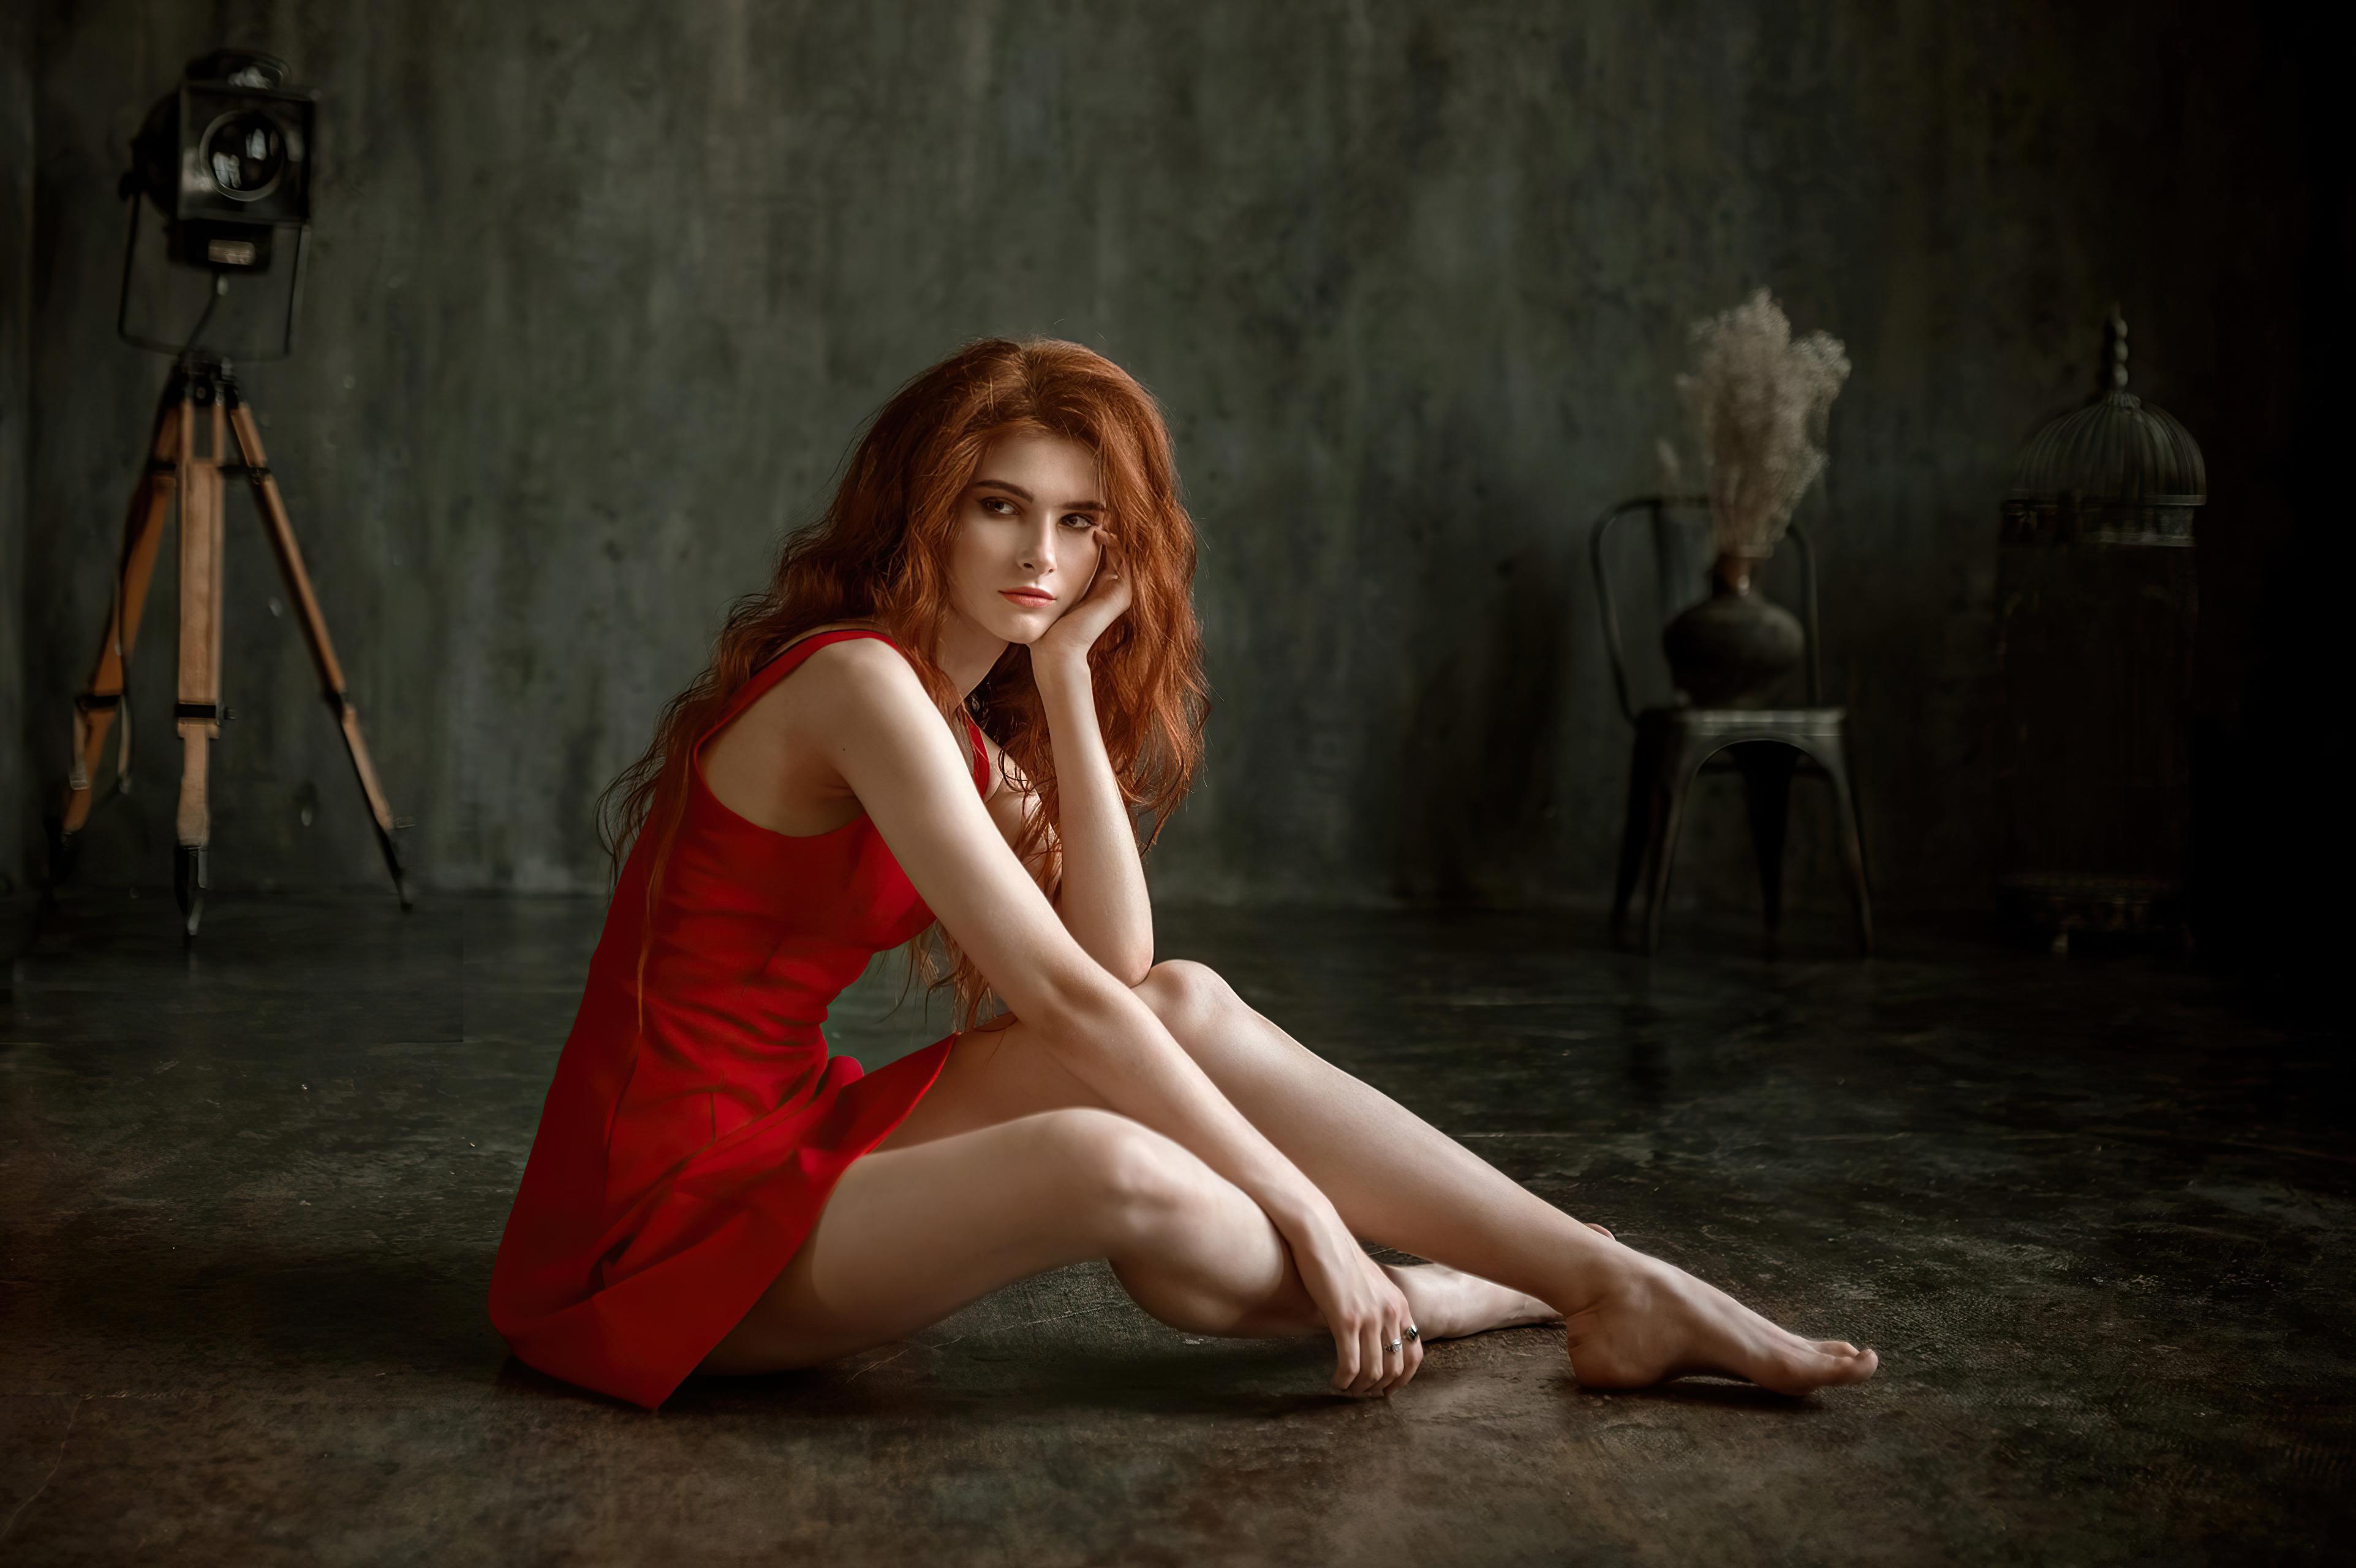 redhead red dress girl sitting 4k 1596916318 - Redhead Red Dress Girl Sitting 4k -